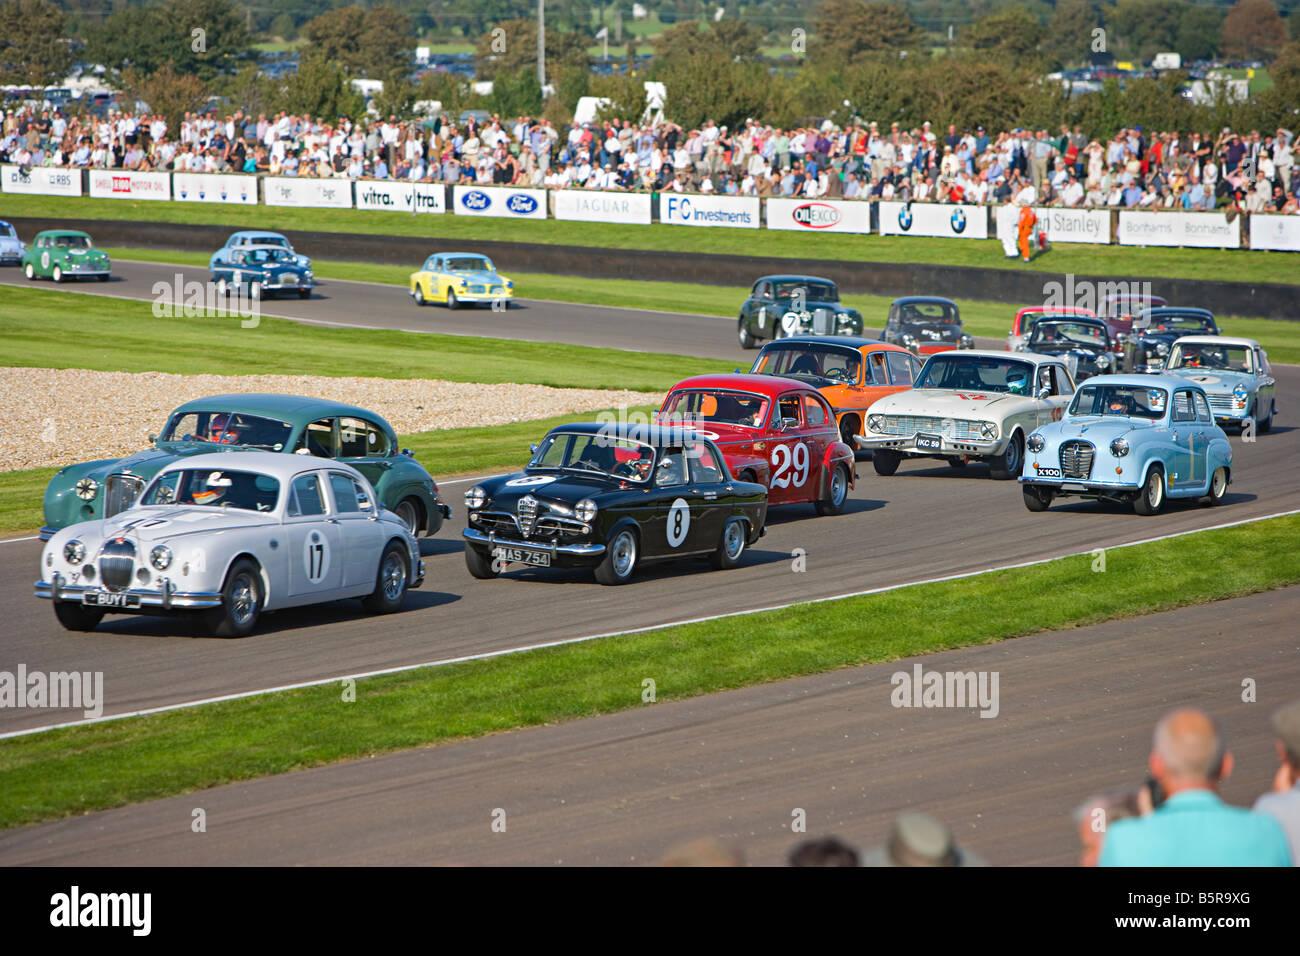 Oldtimer-Rennen in Goodwood Revival, Goodwood, West Sussex. Stockfoto